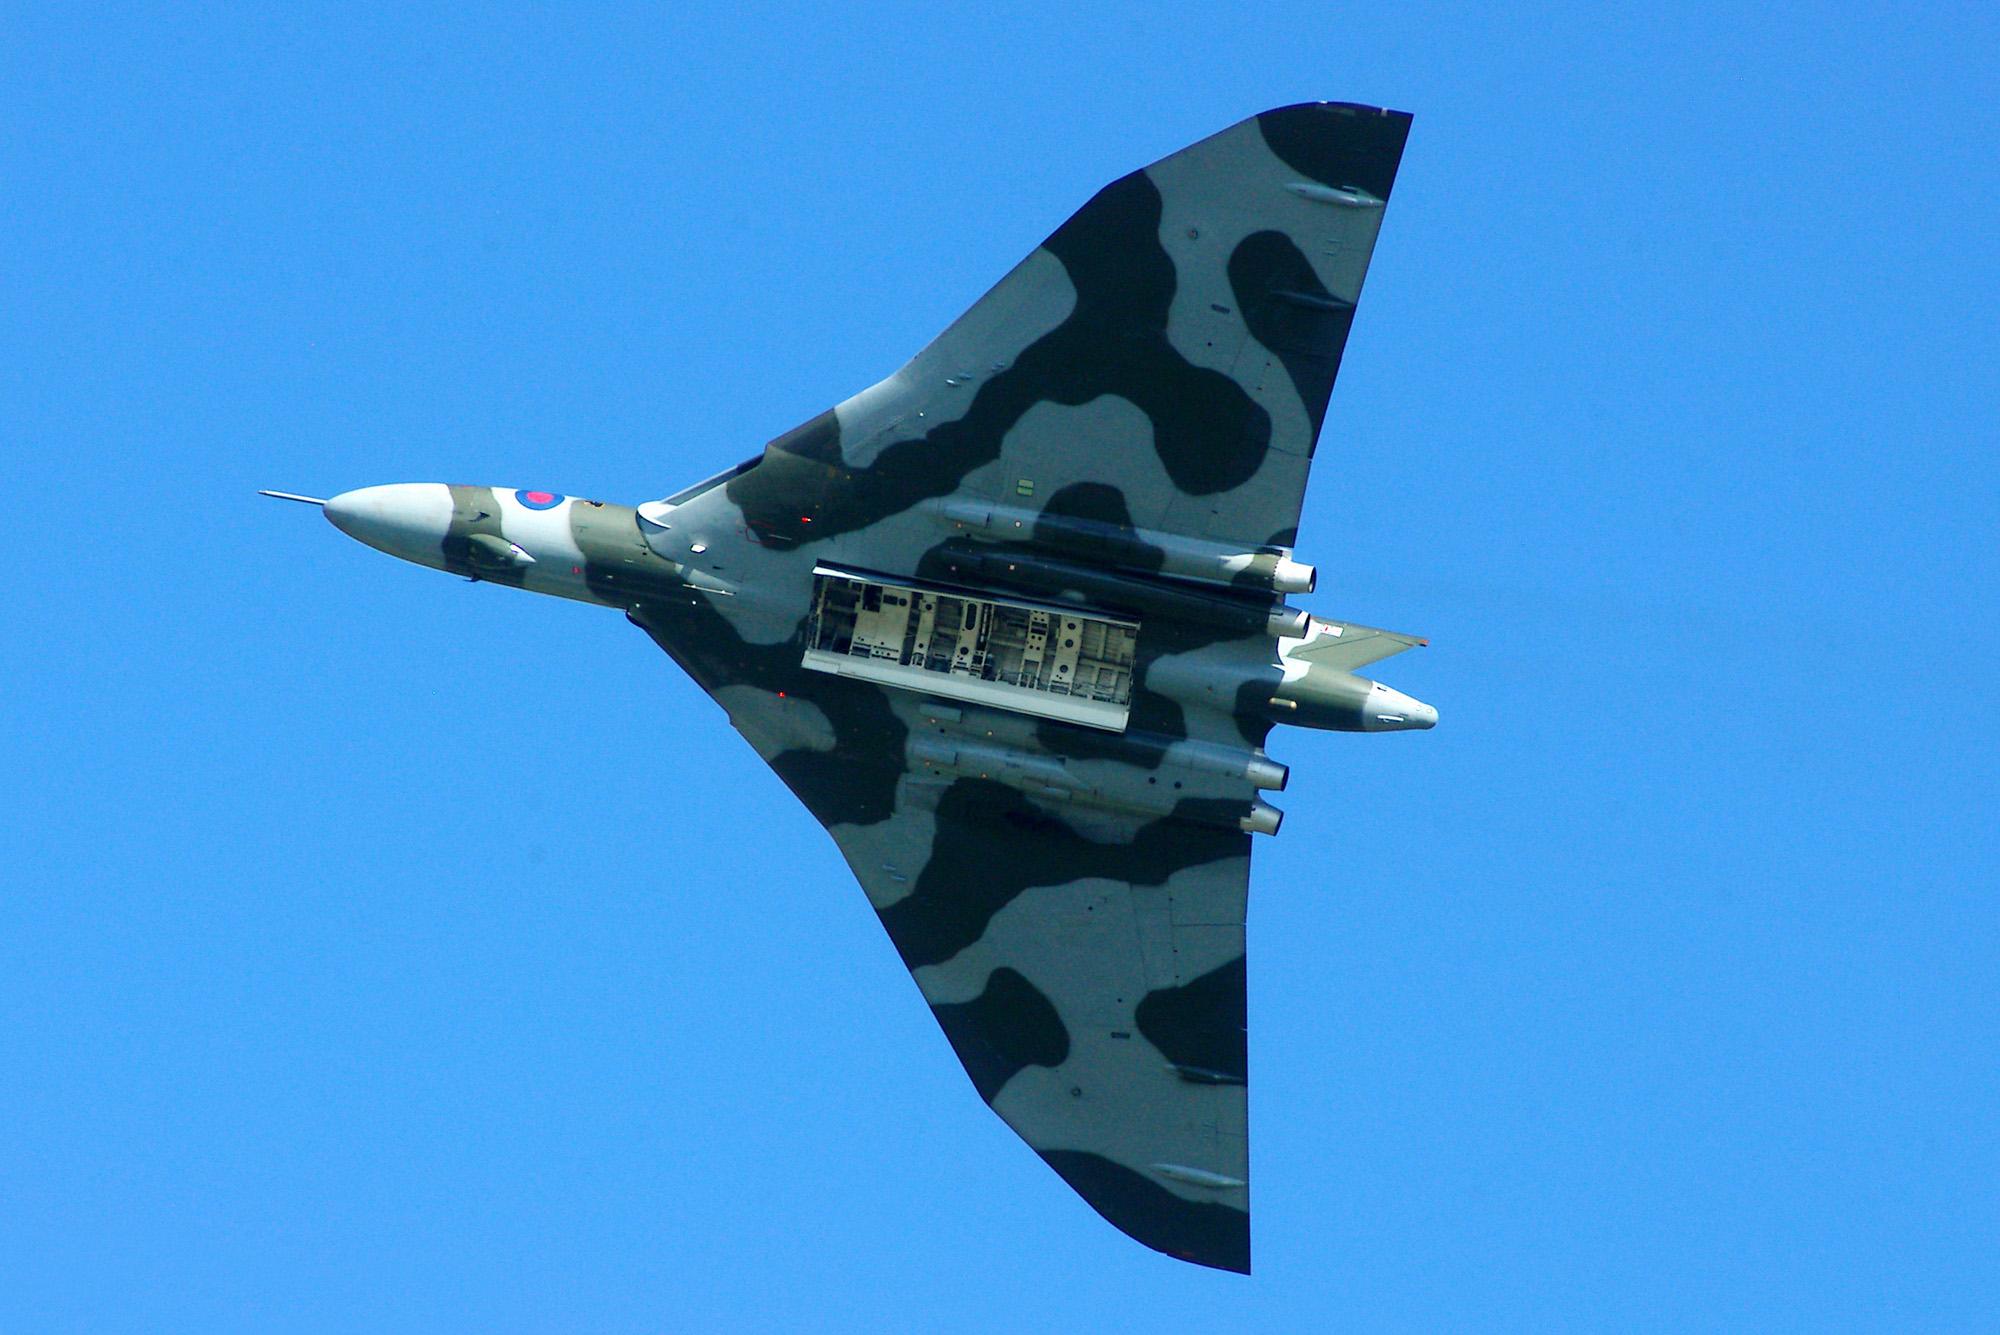 vulcan xh558